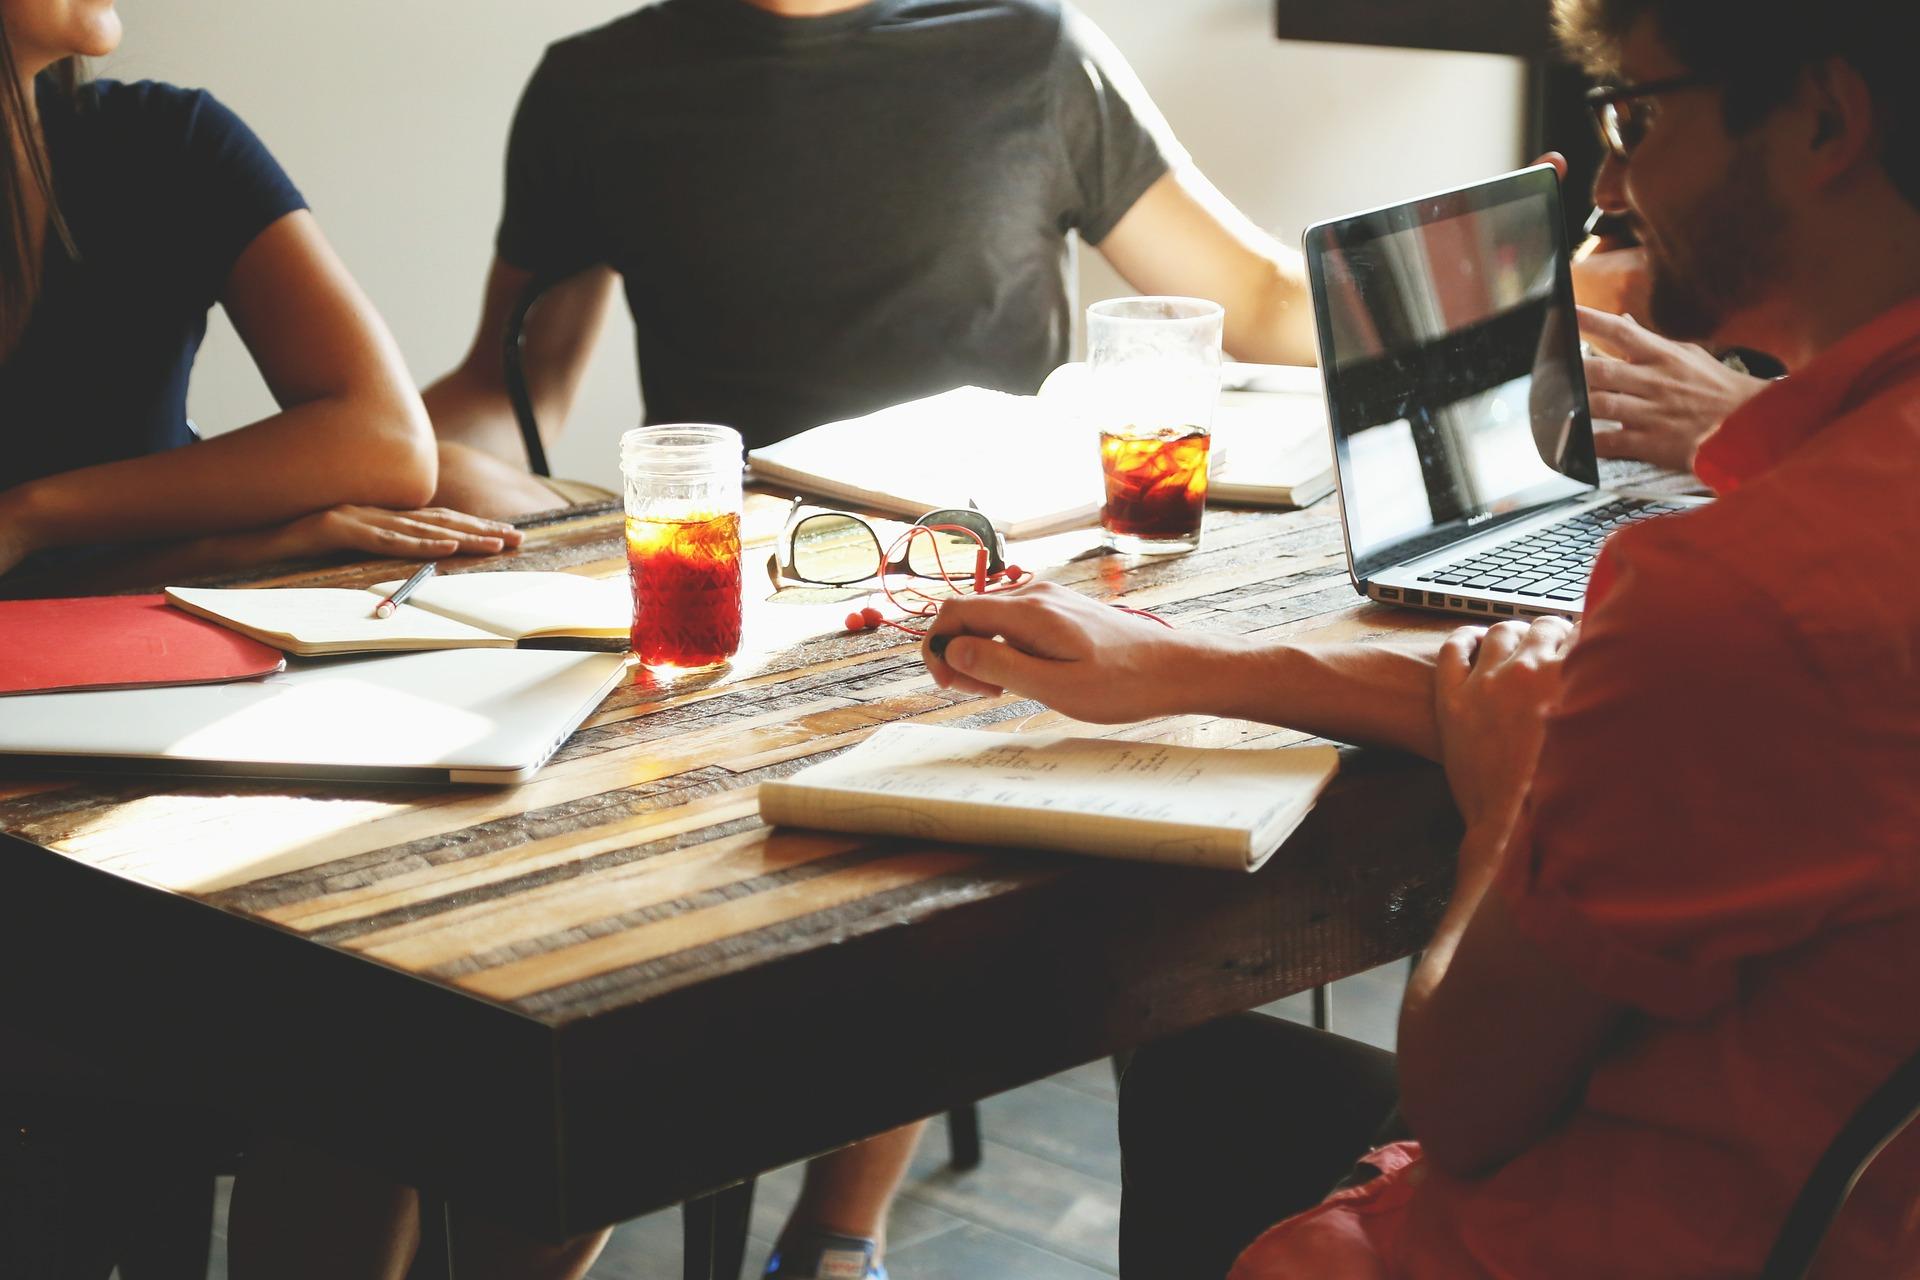 The Office Survival Guide: Beware Talking Politics